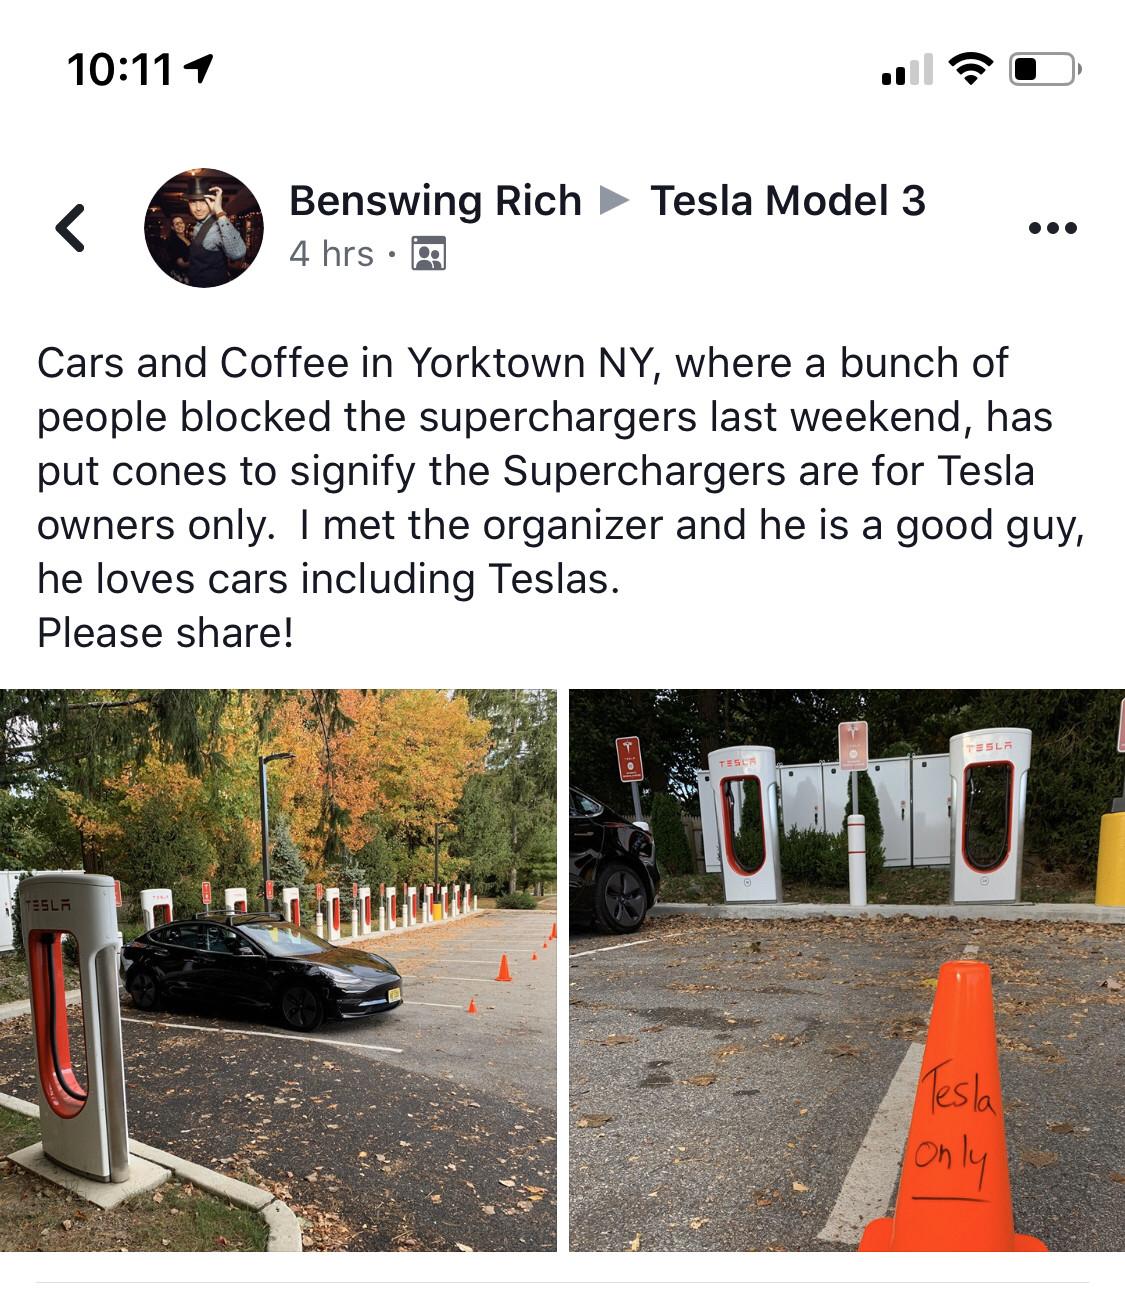 tesla-supercharger-yorktown-3